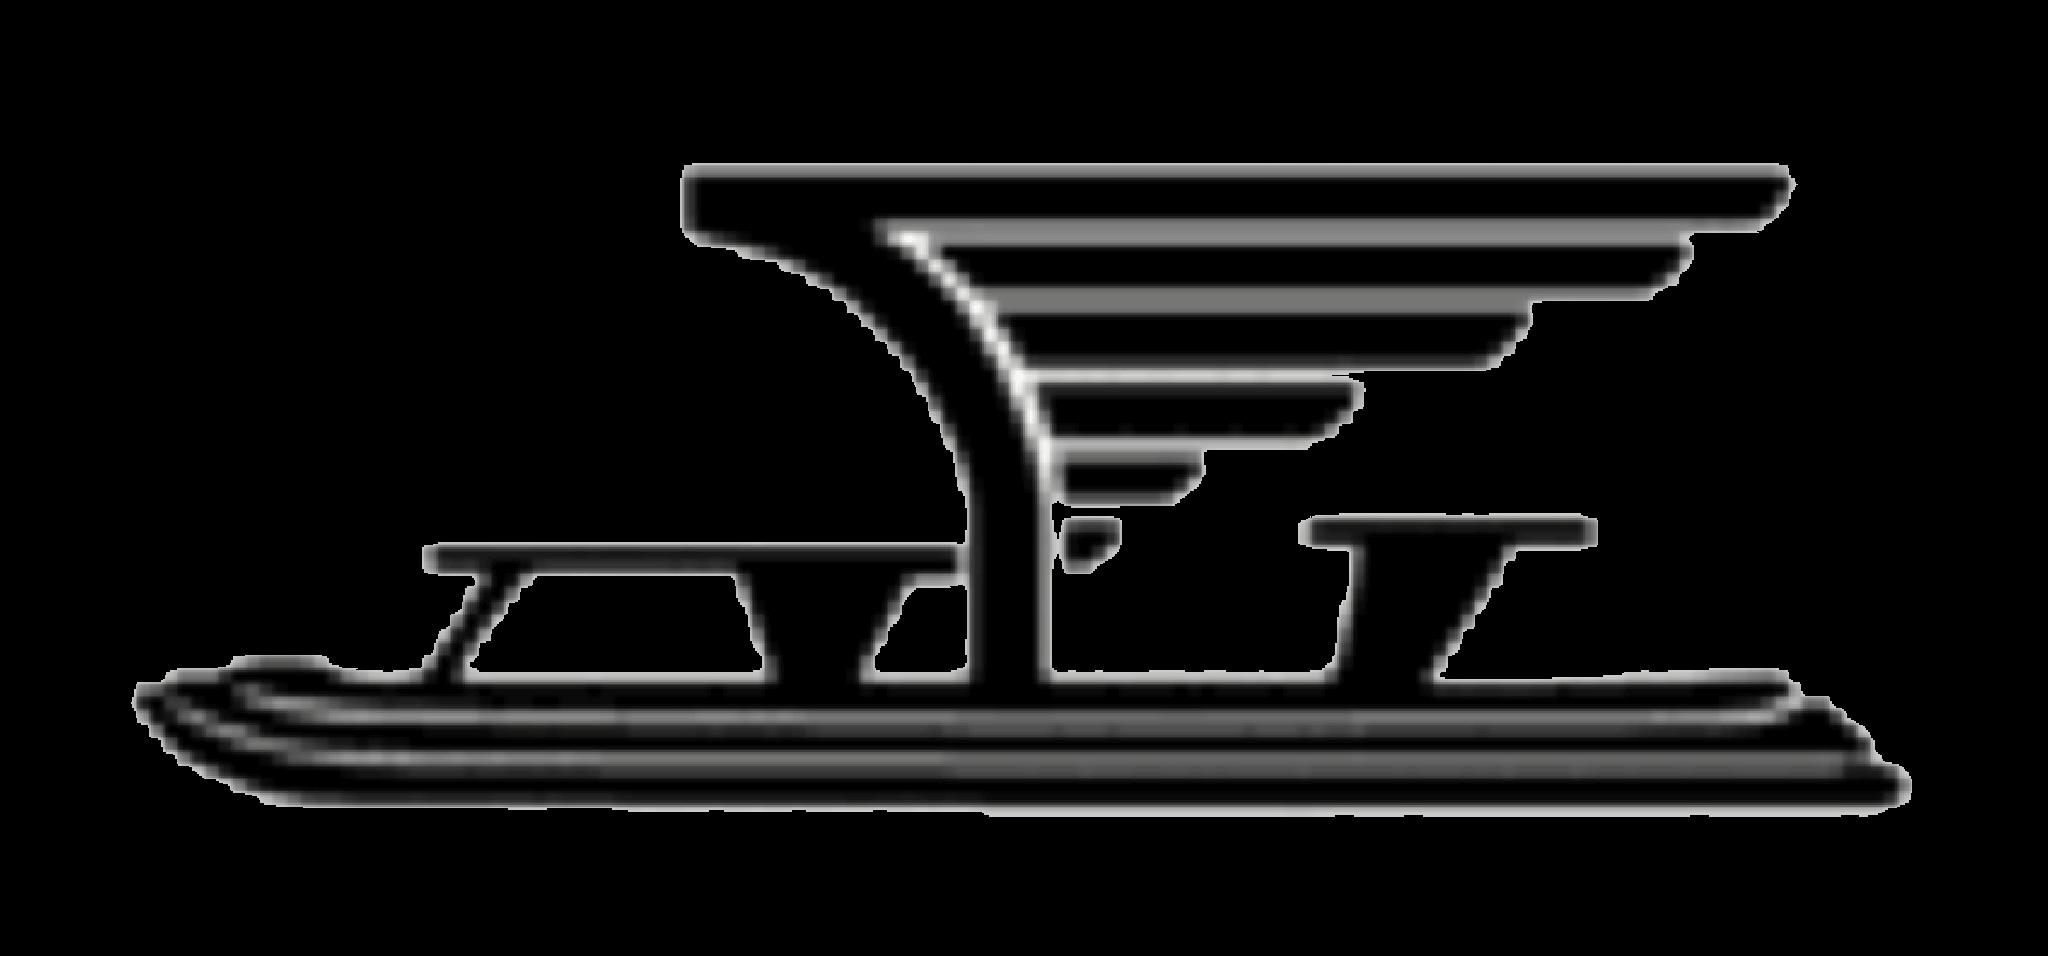 Helsingin Luistin Klubi Ry urheiluseuran logo